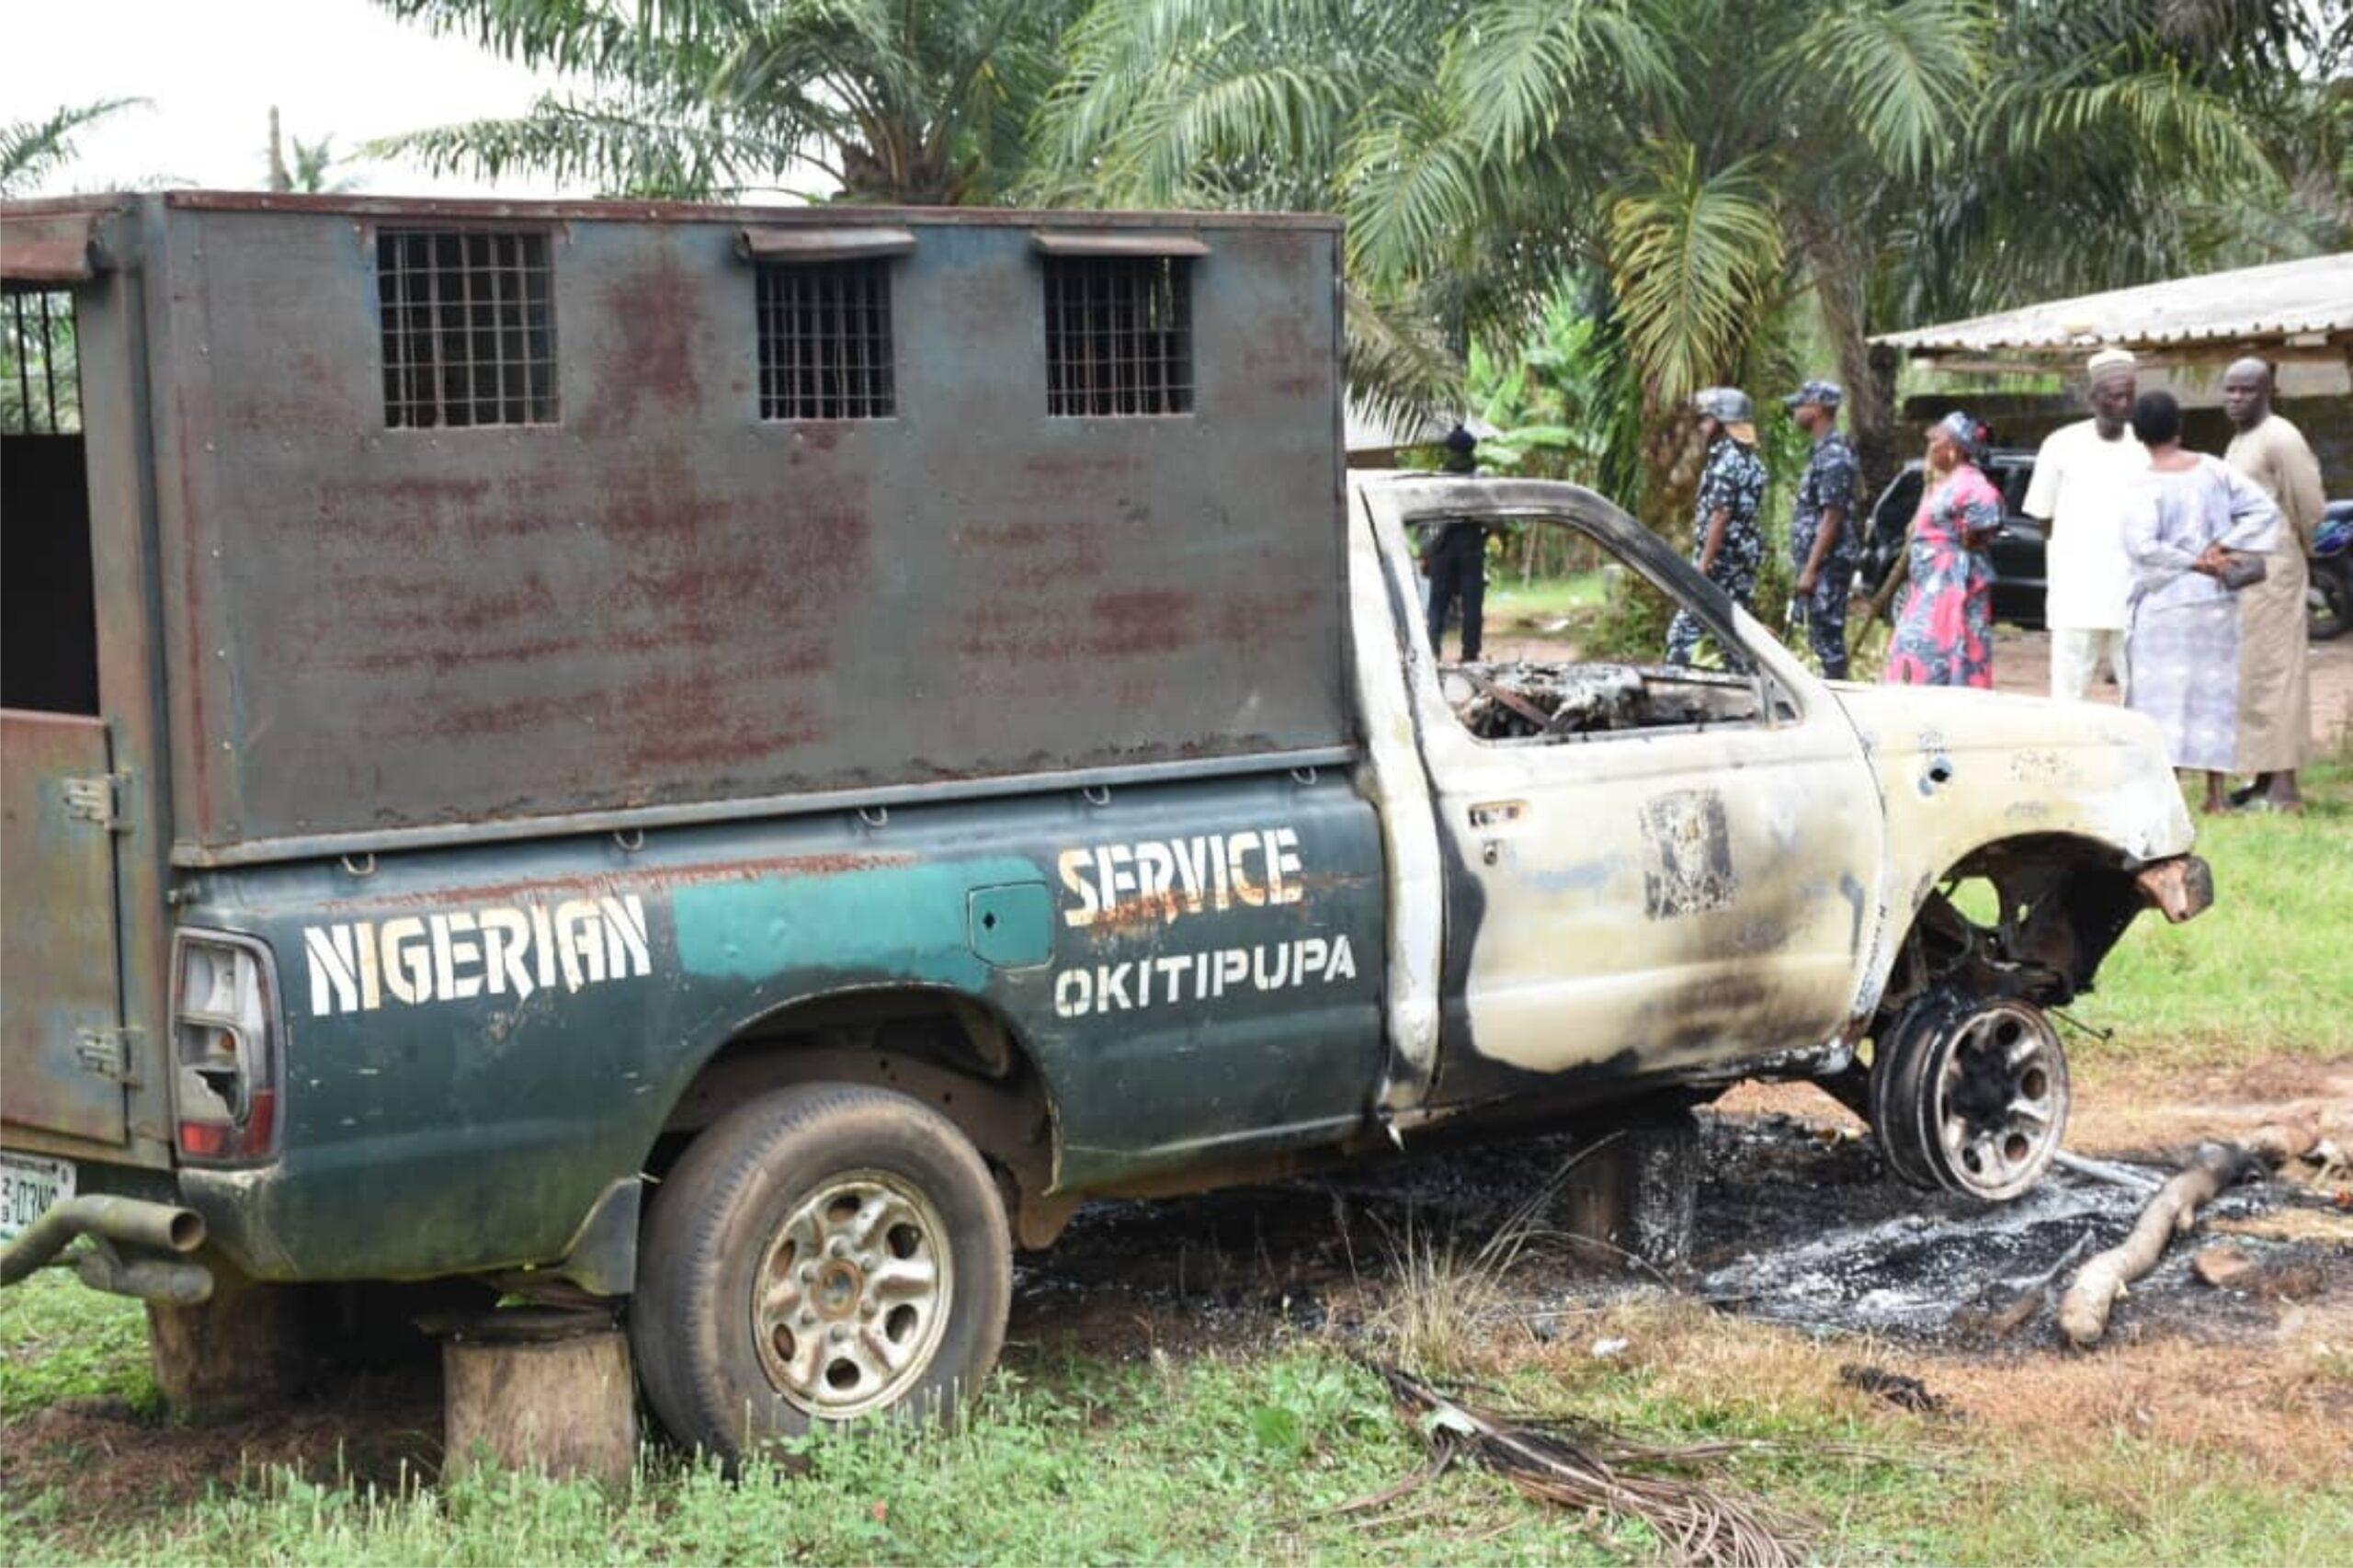 Normalcy returns to Okitipupa as residents seek peace